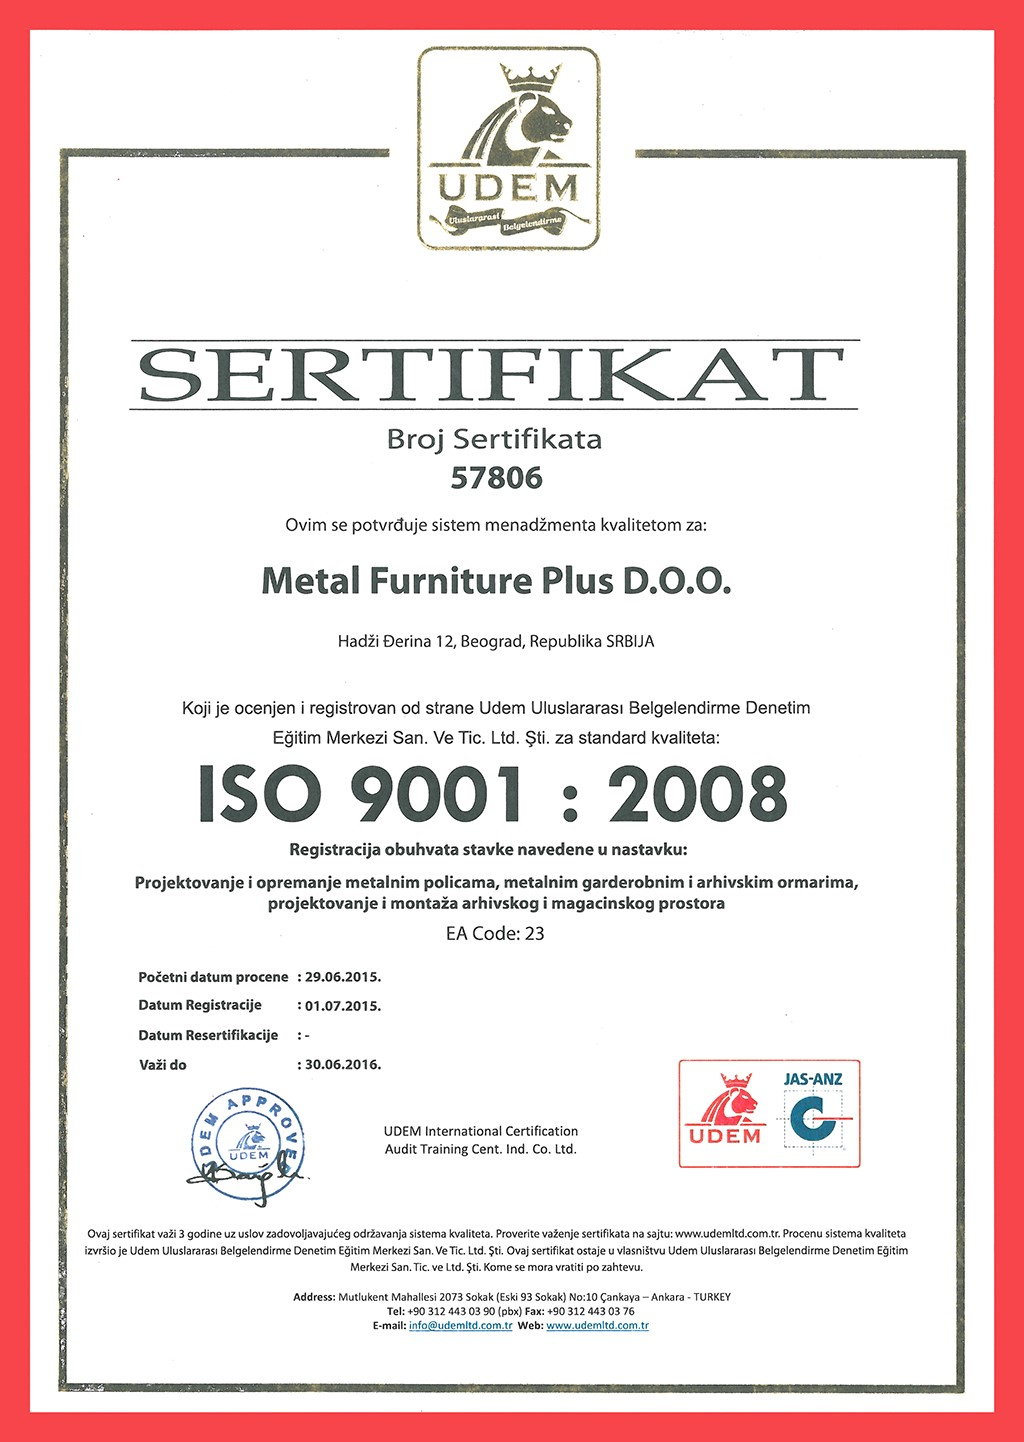 Sertifikat ISO 9001 : 2008